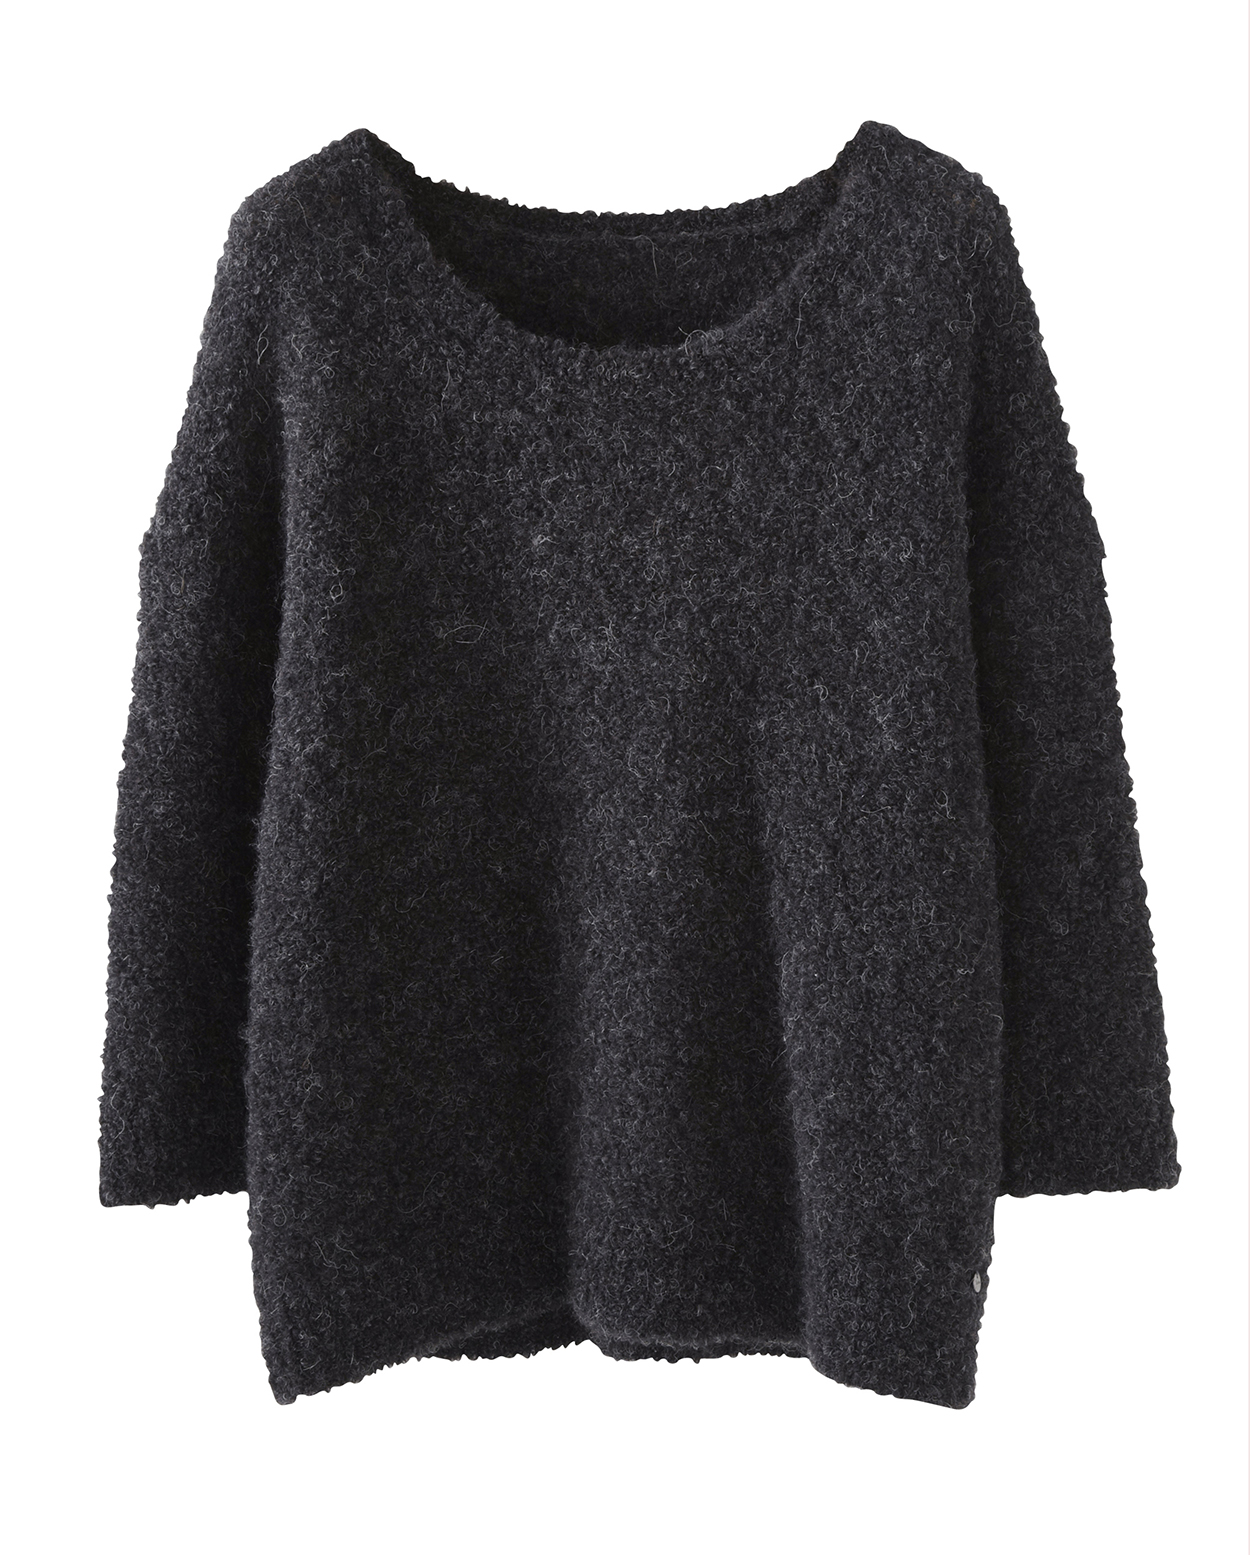 Zippora Sweater Wrap London Zipora Black Jeans Image Of Marl